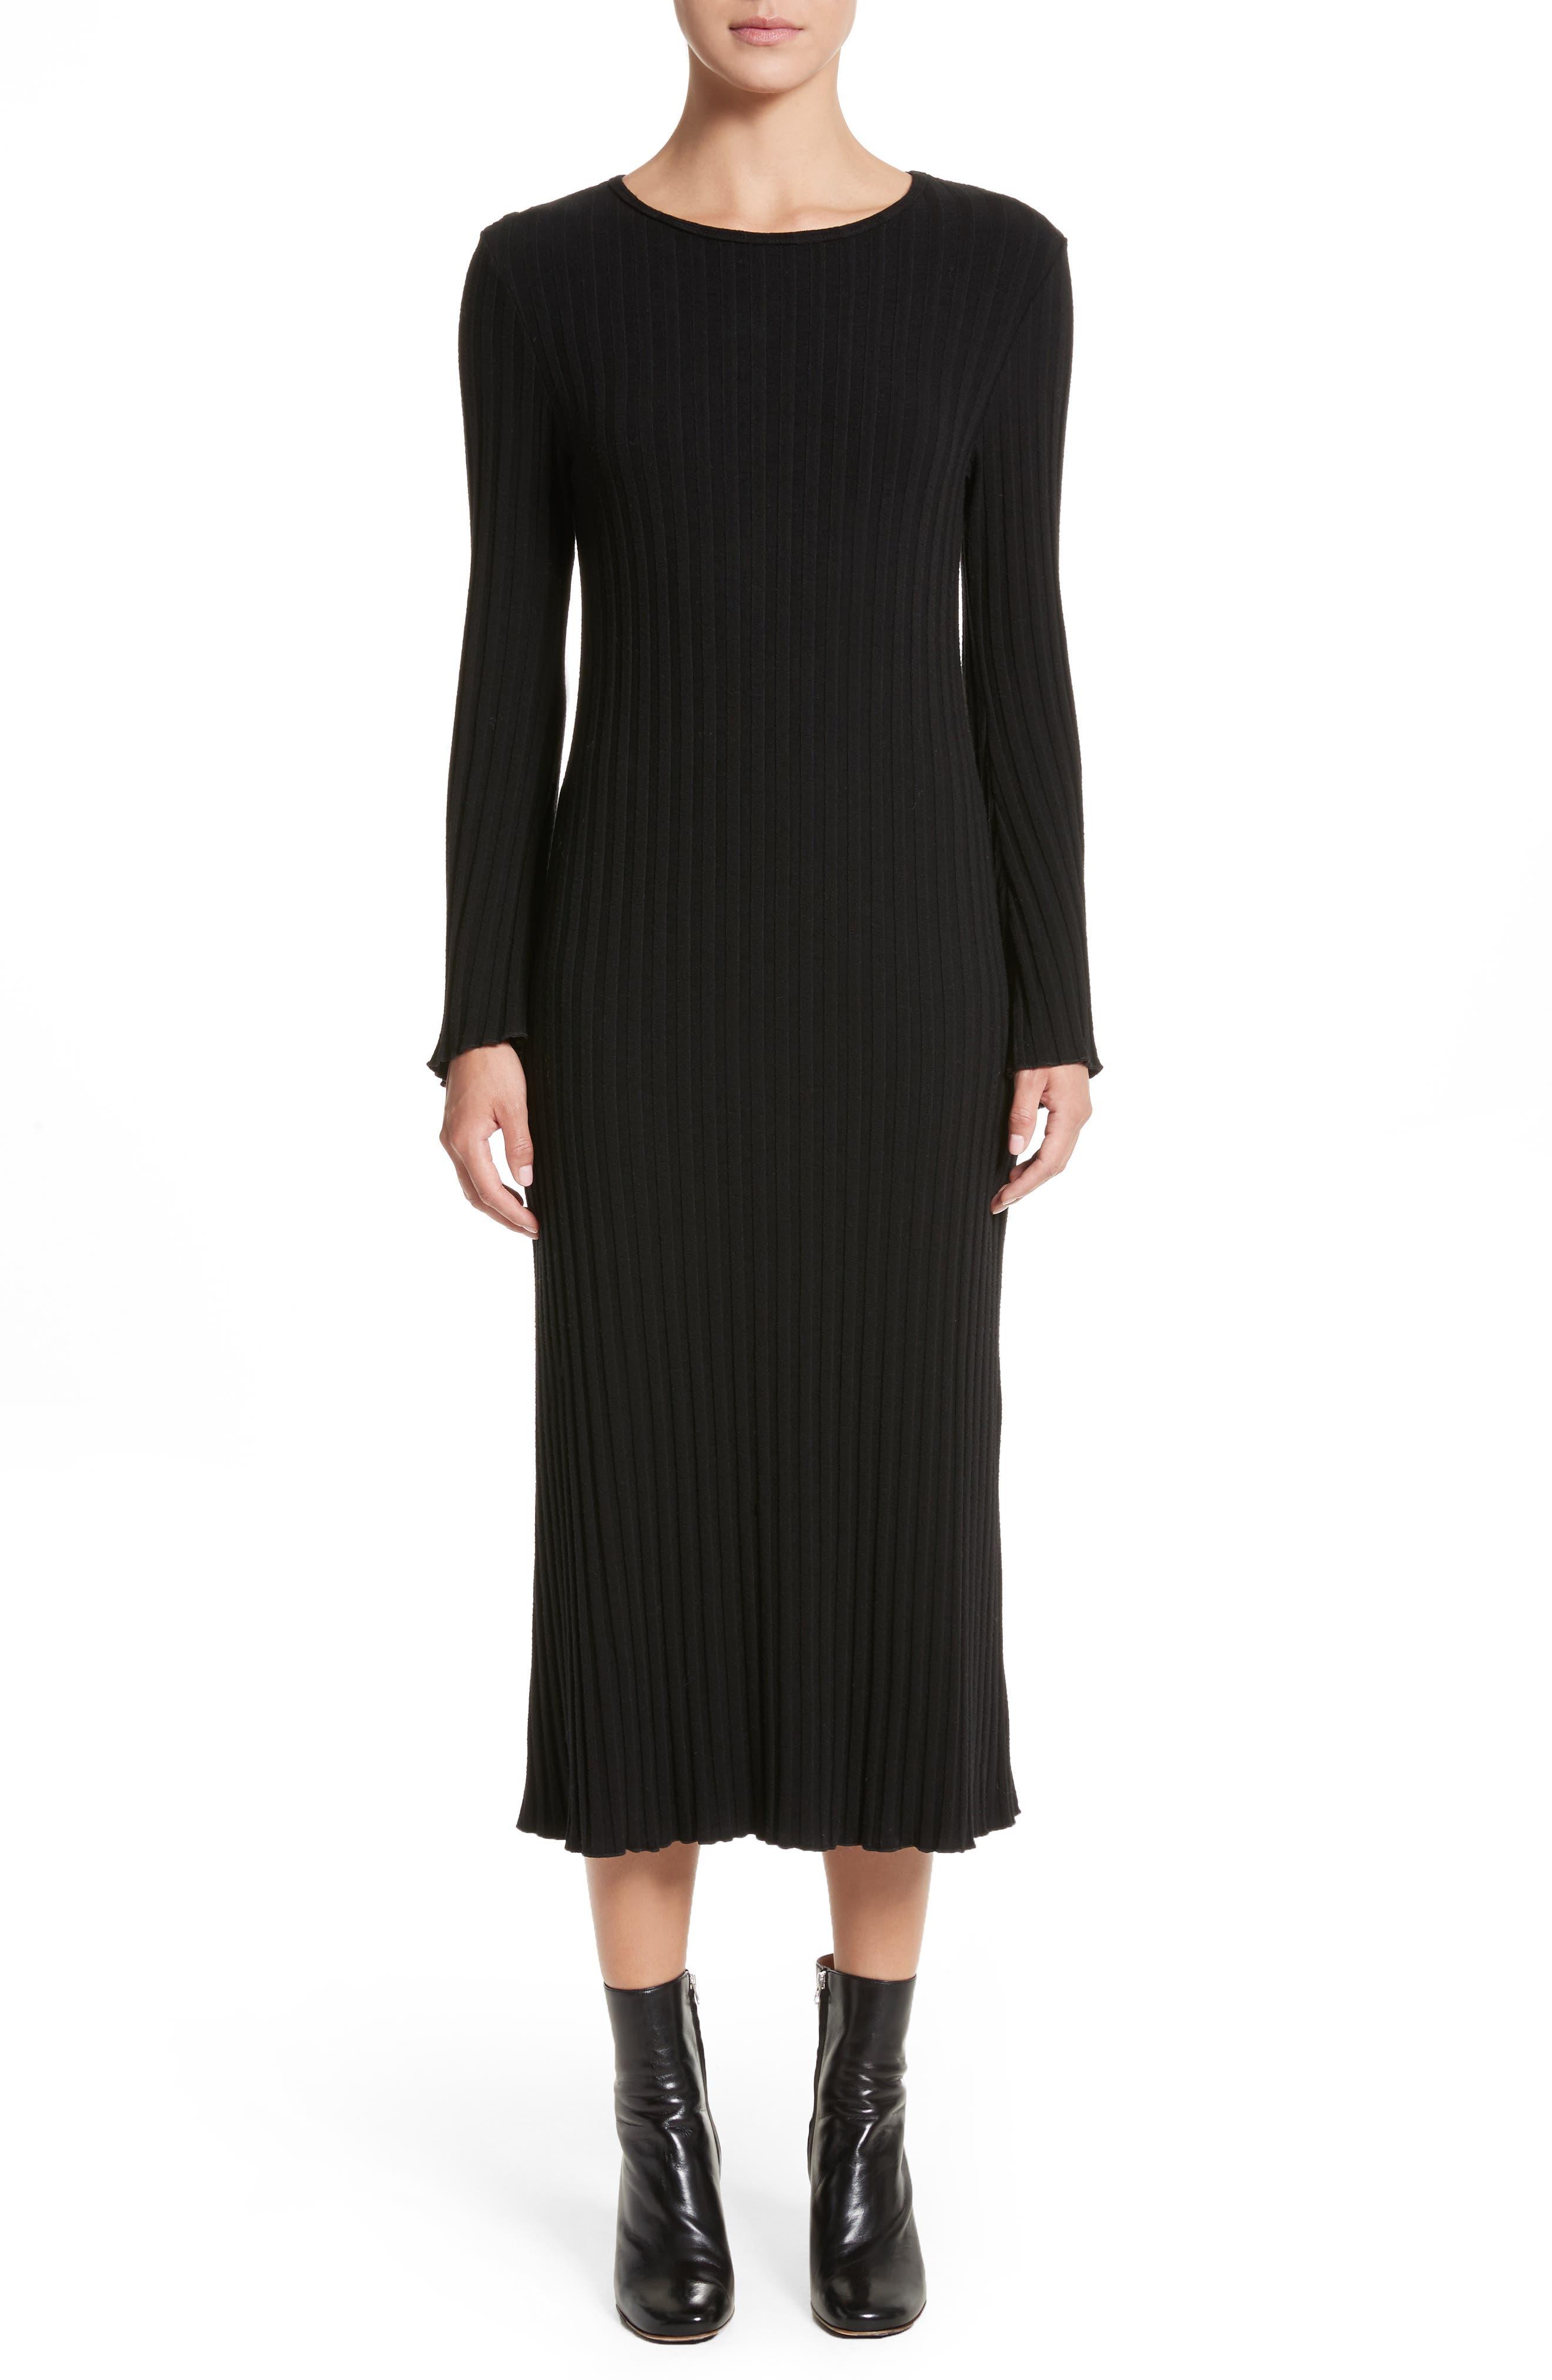 Simon Miller Wells Rib Knit Dress